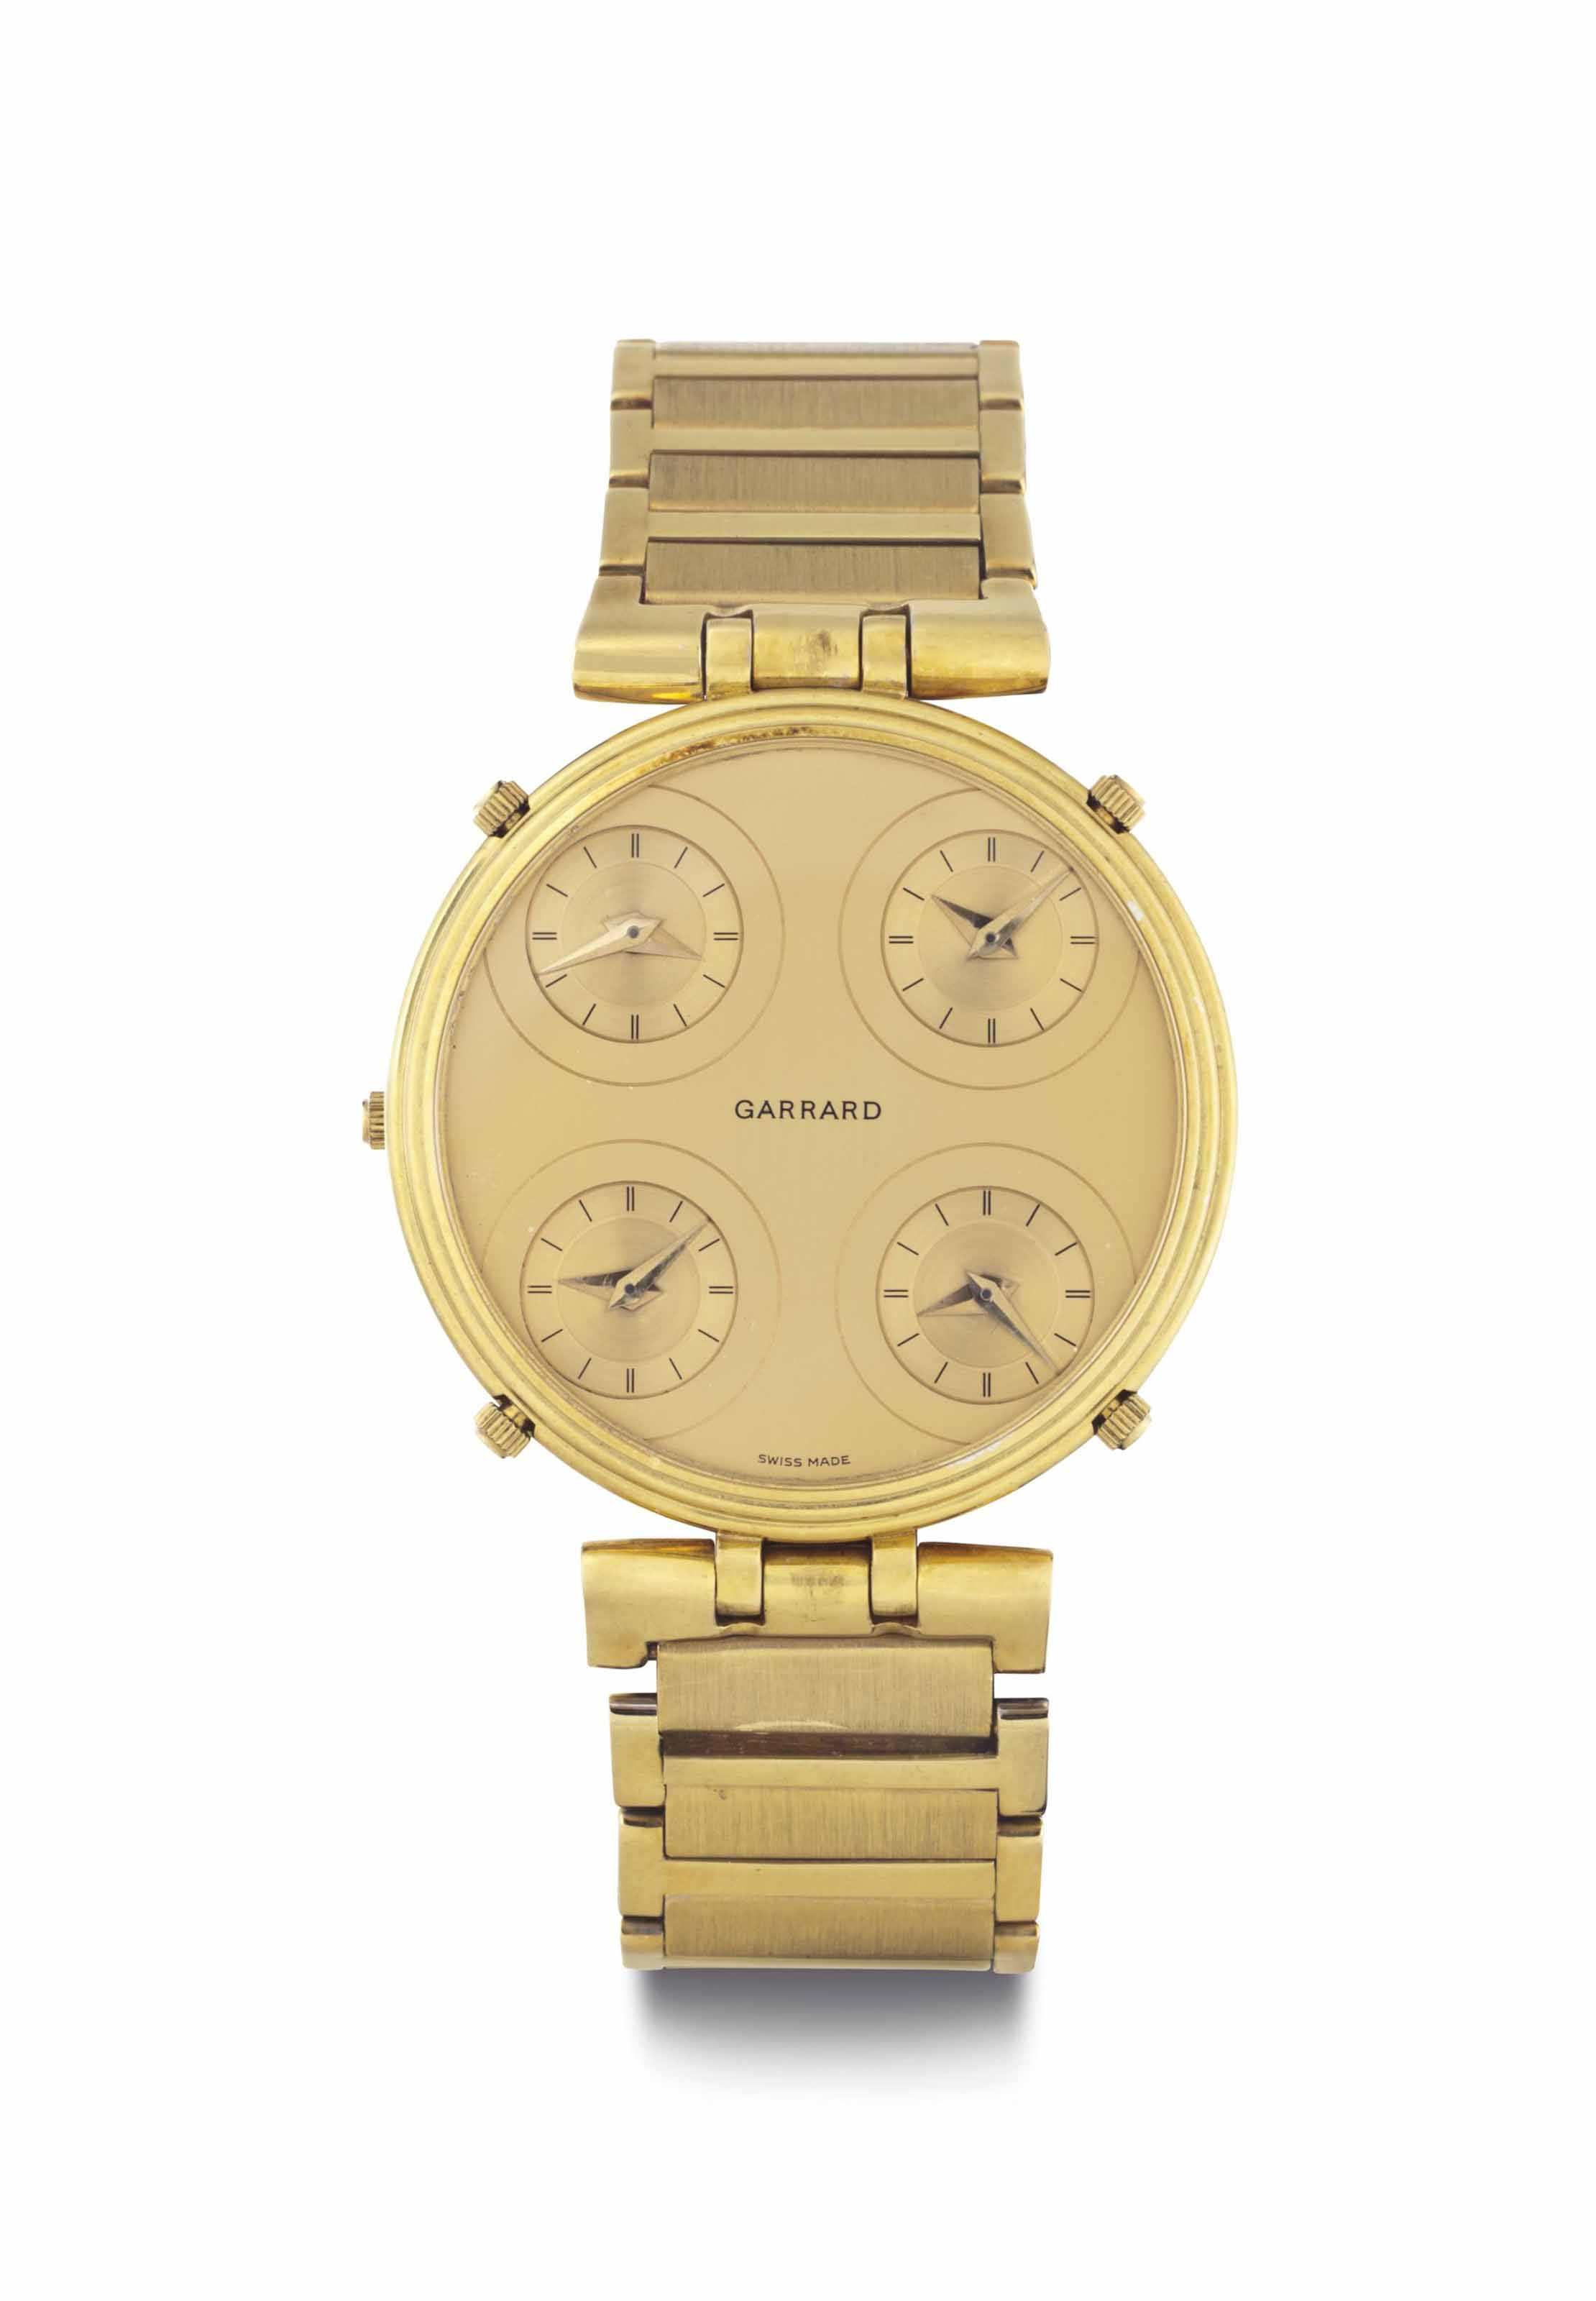 Sarcar & Garrard. A Two-Color 18k Gold Reversible Bracelet Wristwatch with Five Time Zones